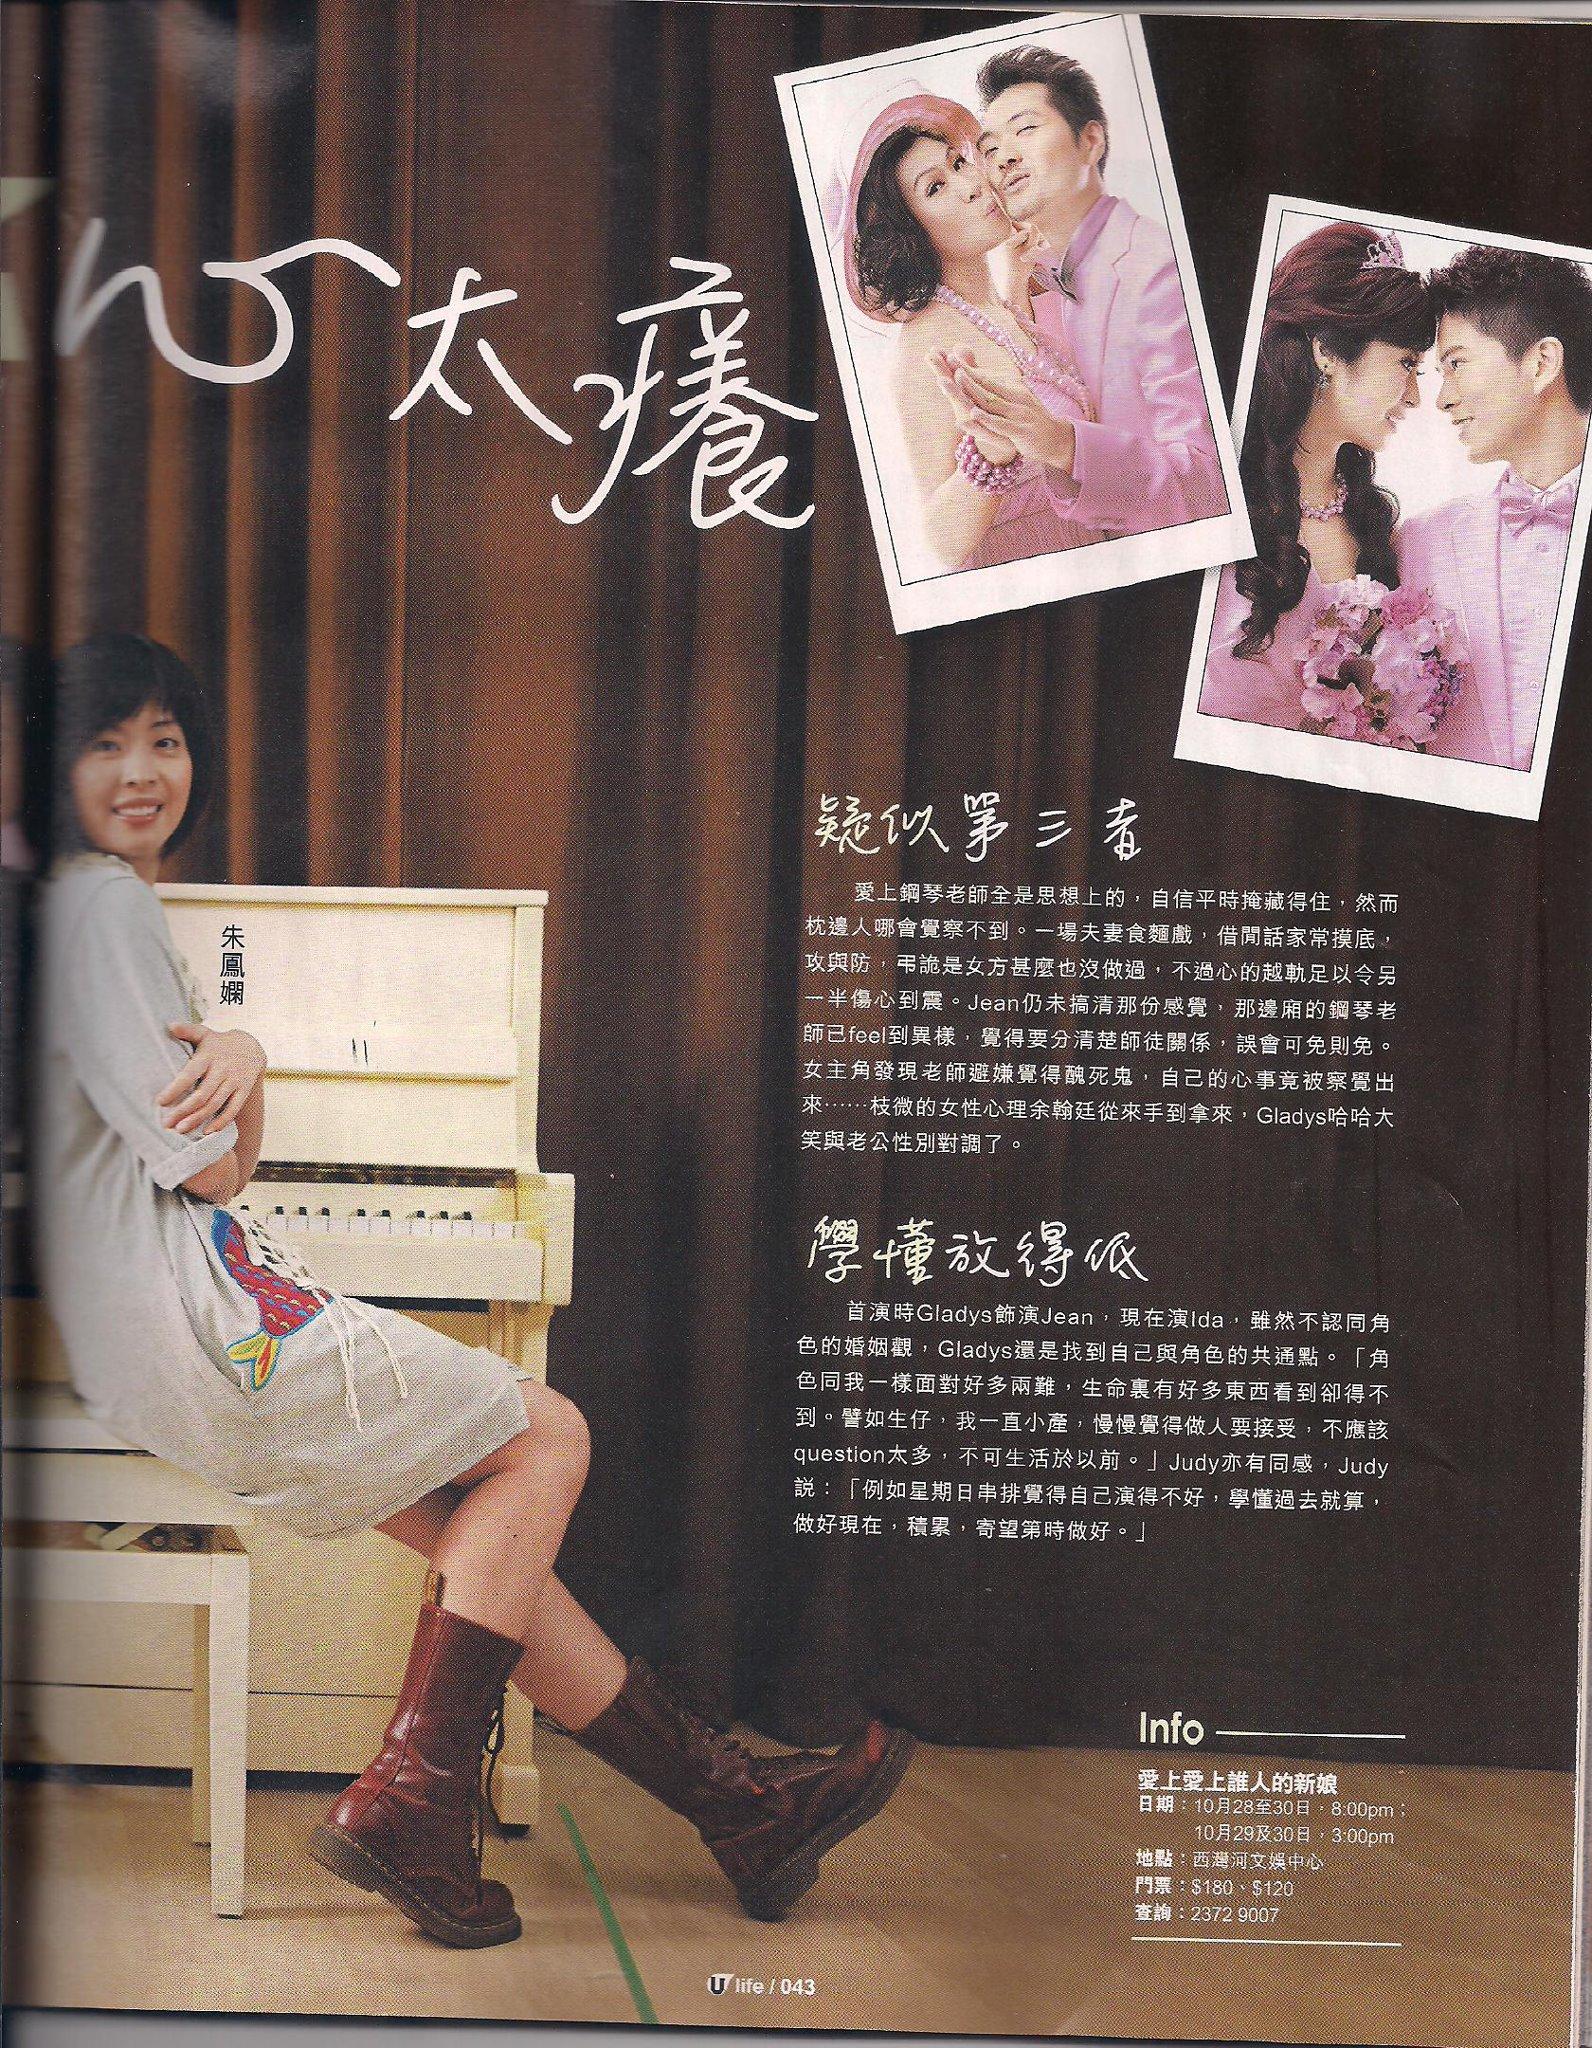 U Magazine 訪問 ﹣愛上愛上誰人的新娘